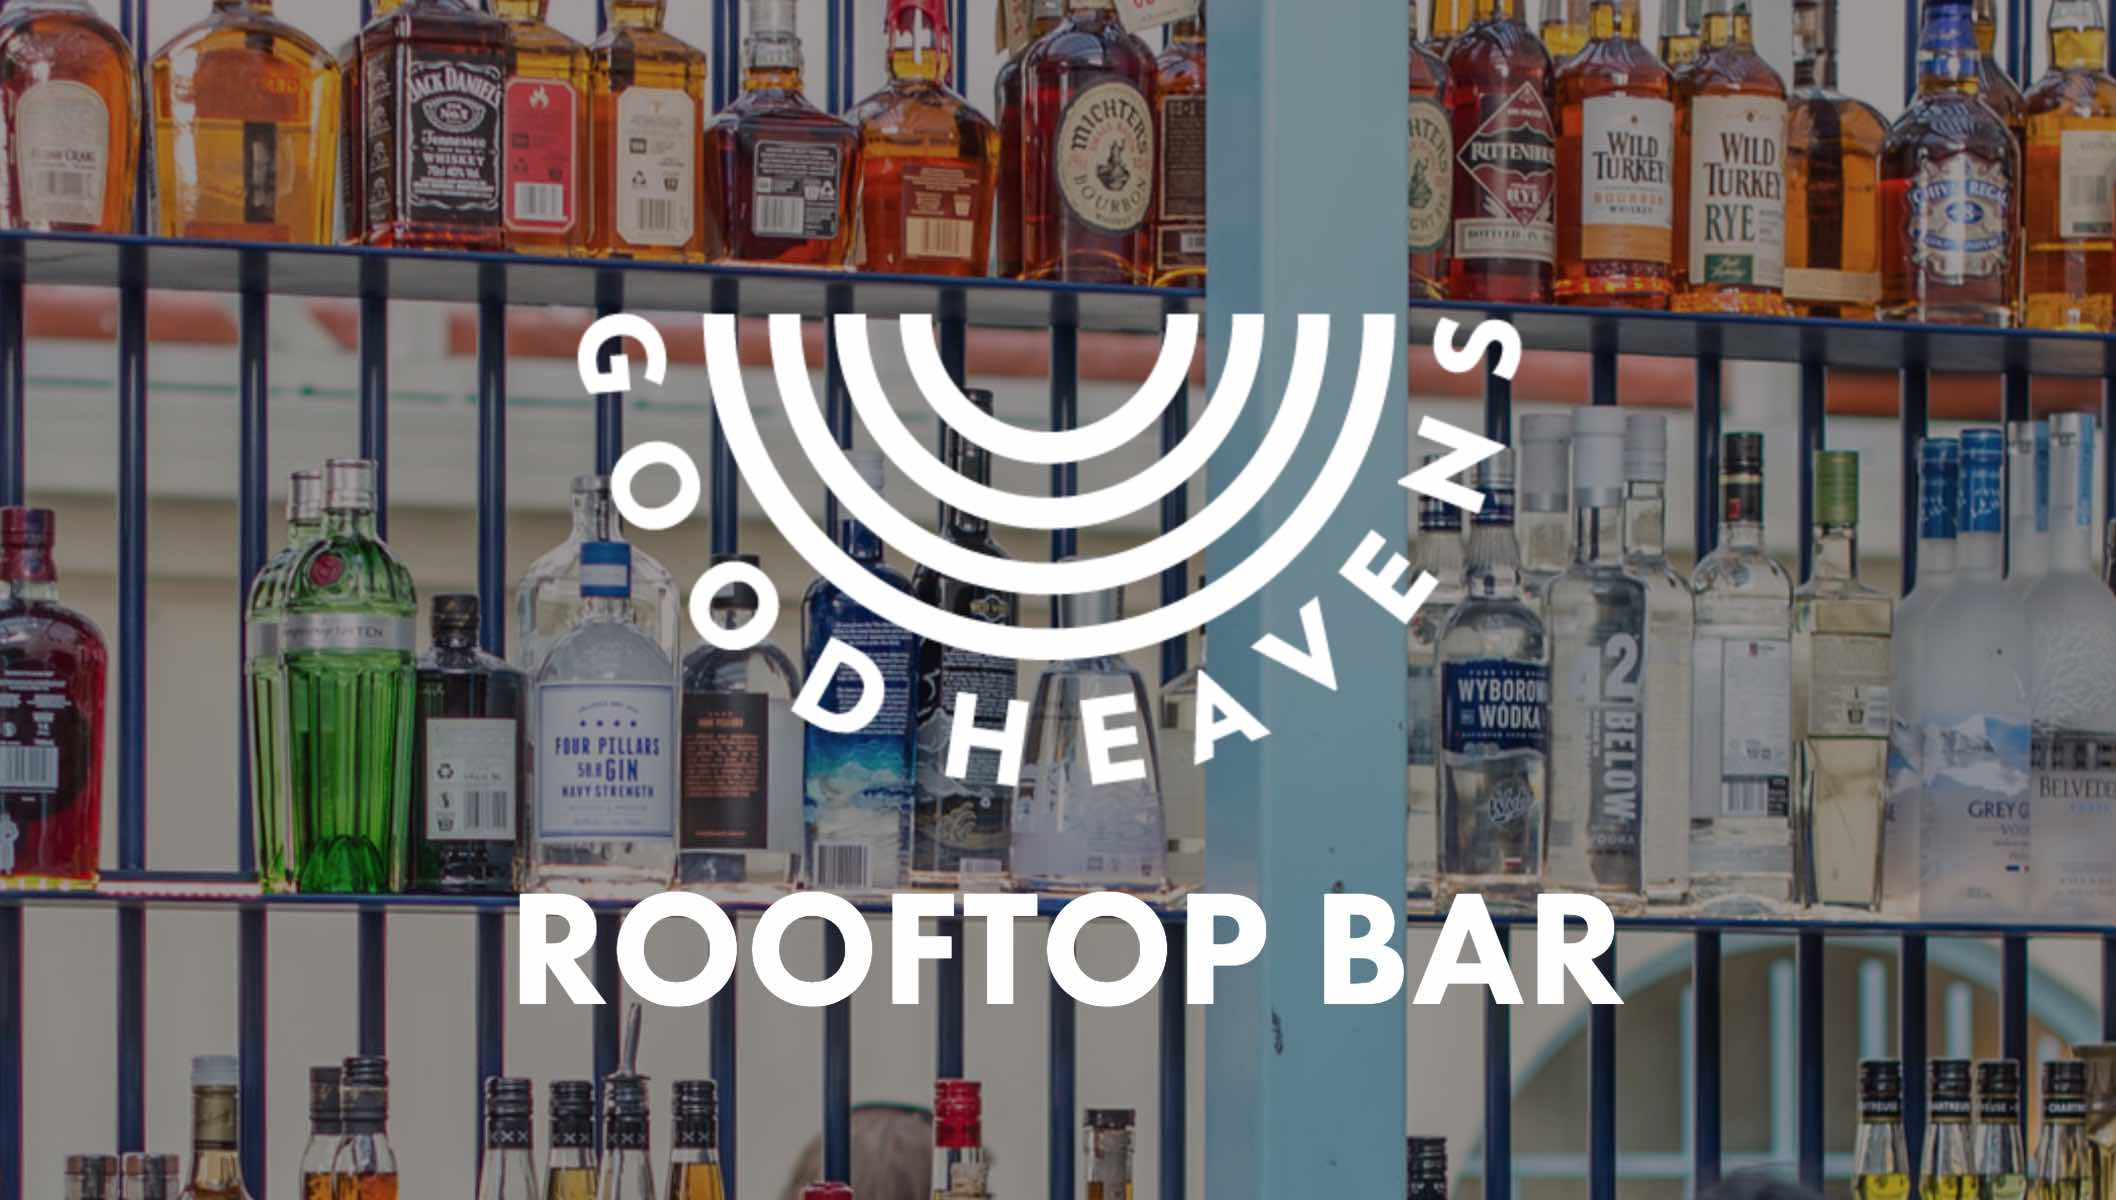 Good Heavens Rooftop Bar - Best Melbourne Rooftop Bars